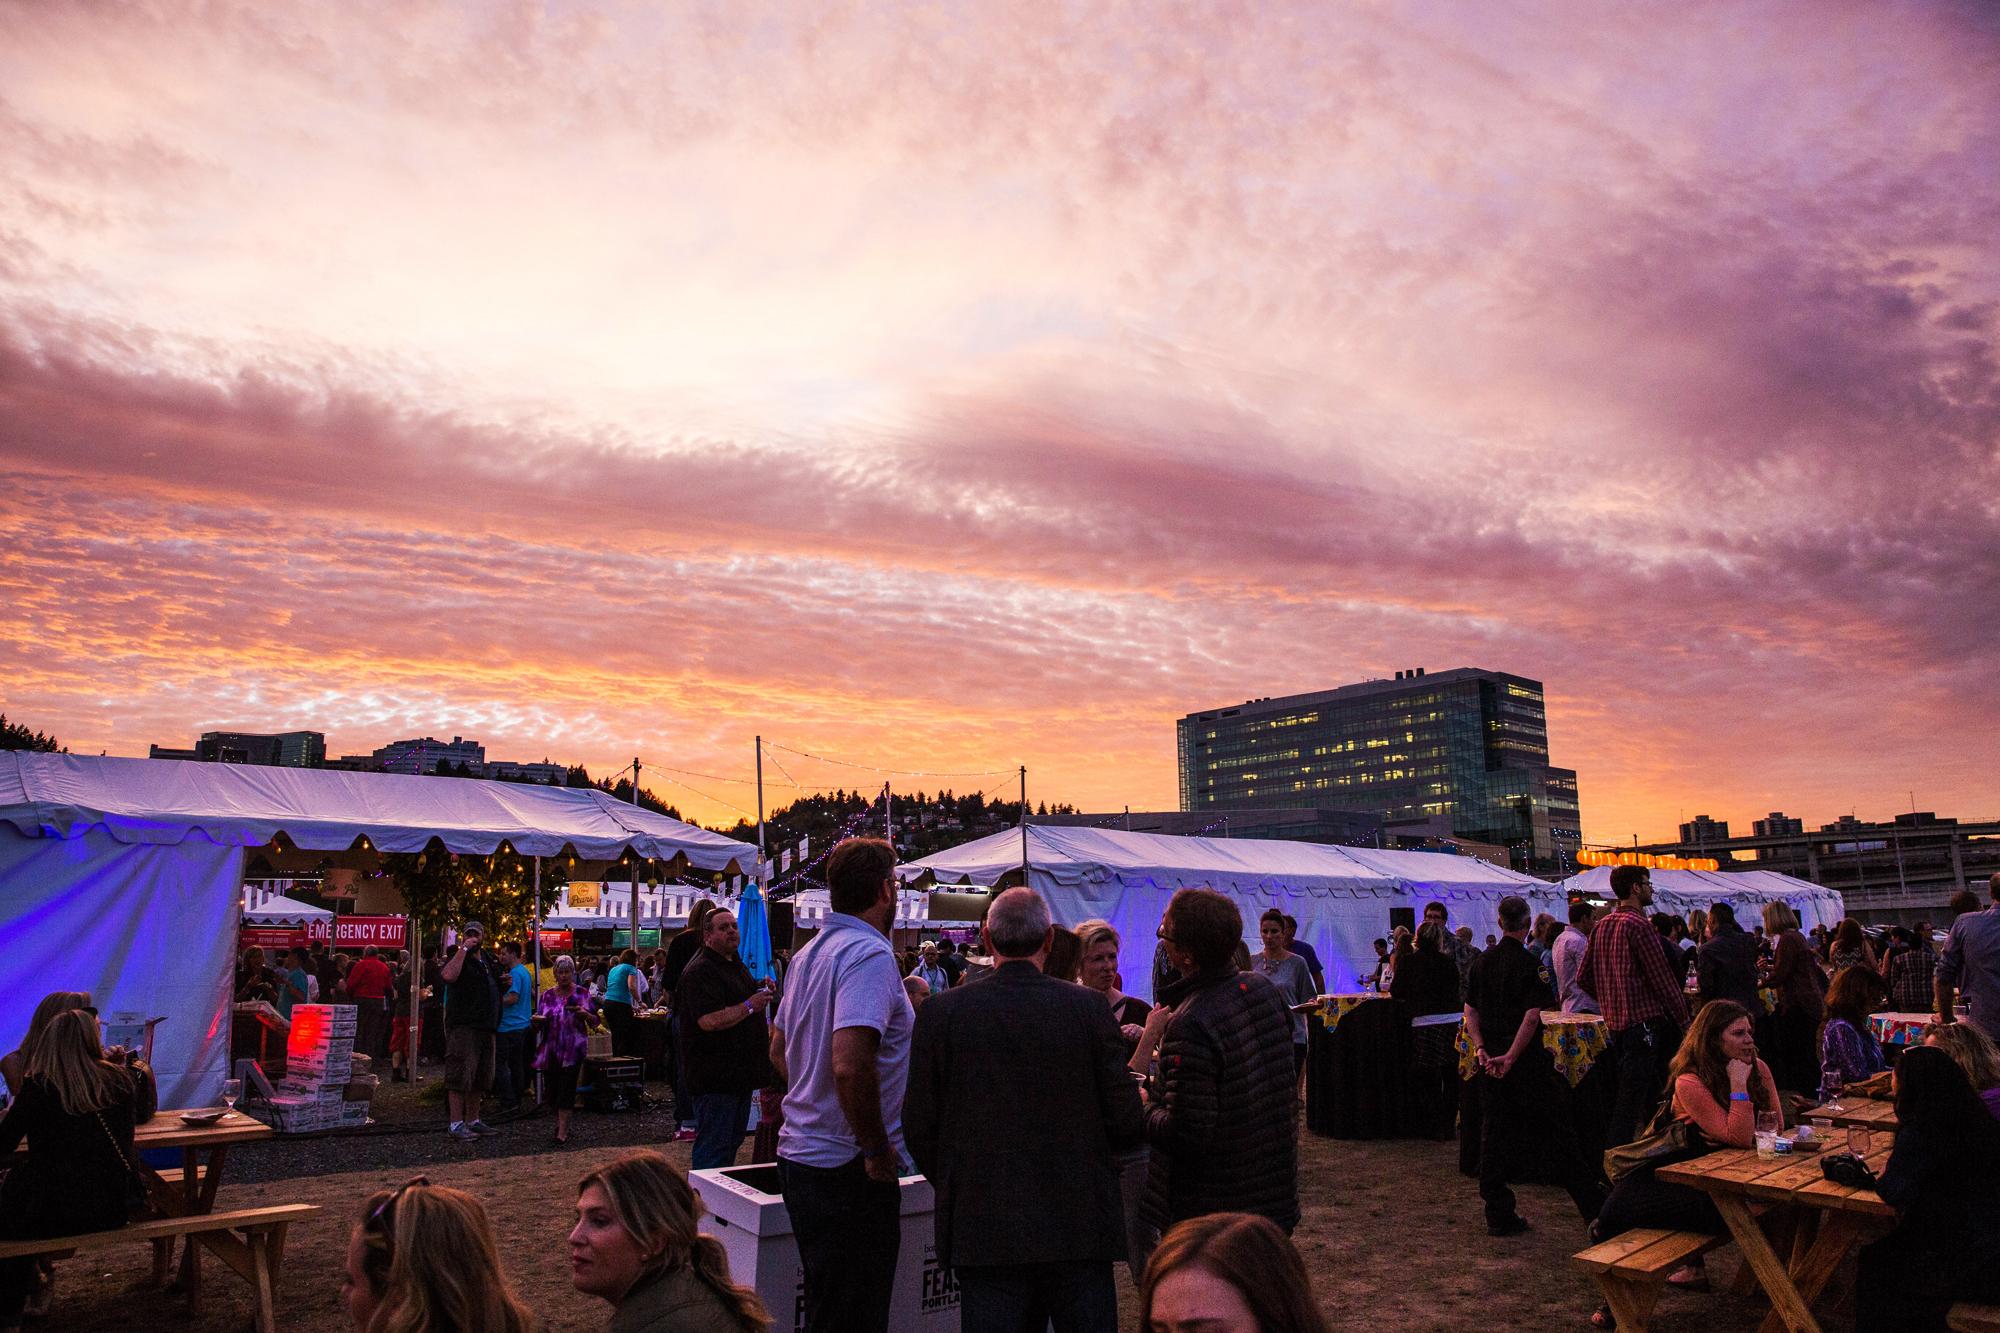 Sunset at the Feast Night Market